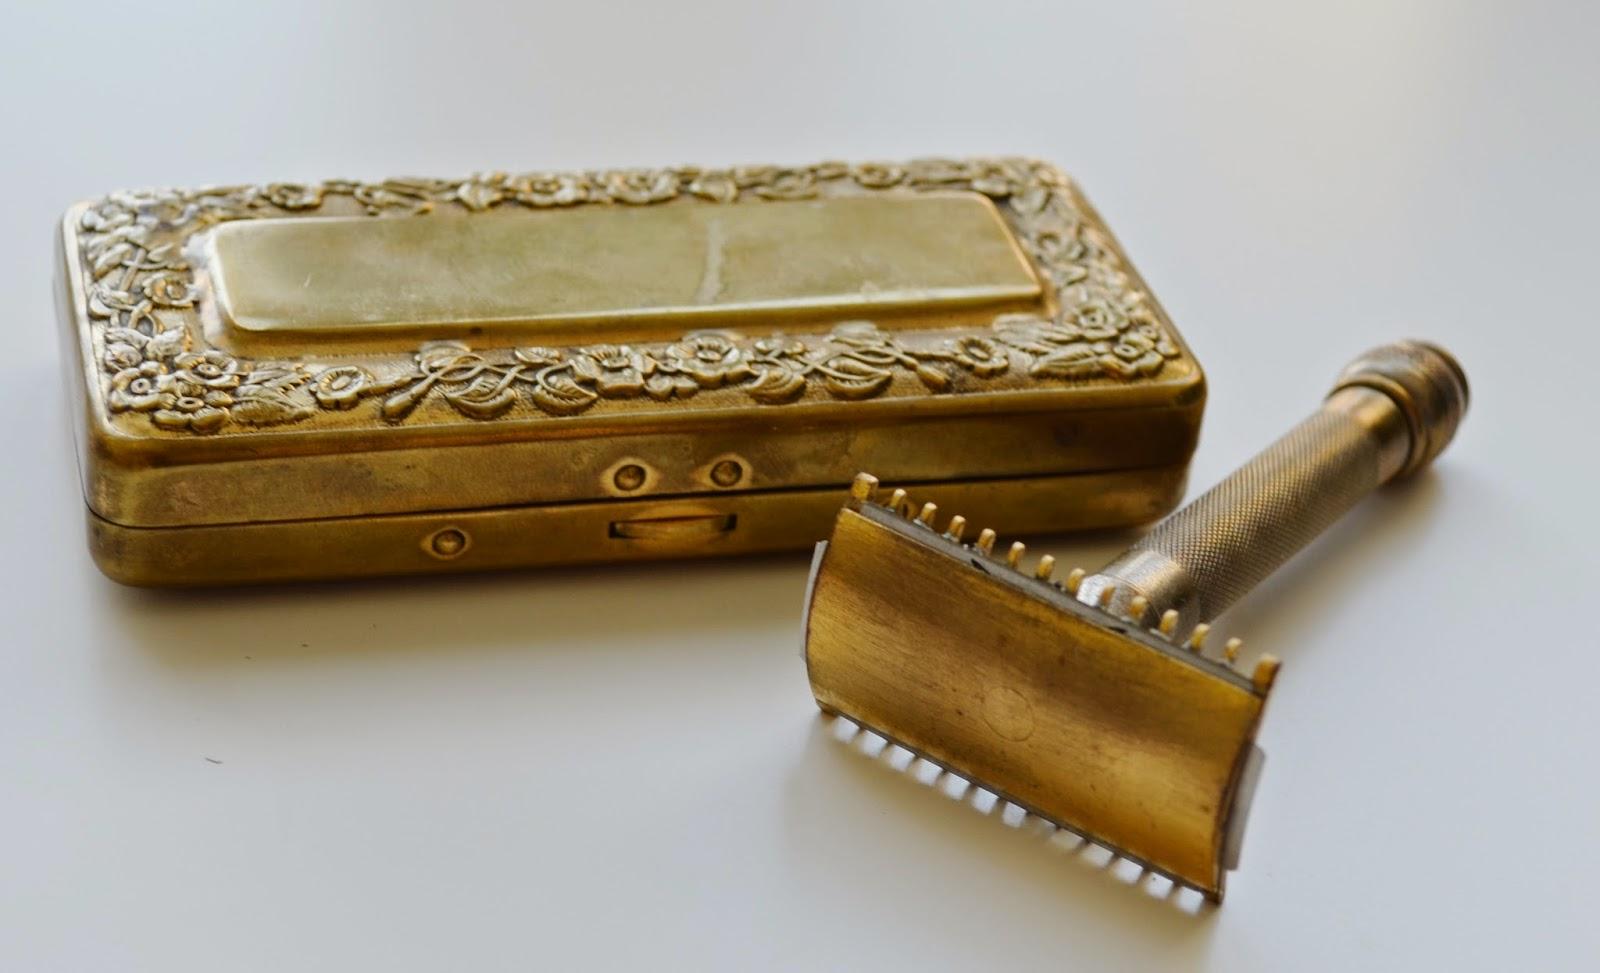 Gillette 1920's vintage travel safety razor, double edge, open comb, assembled front view